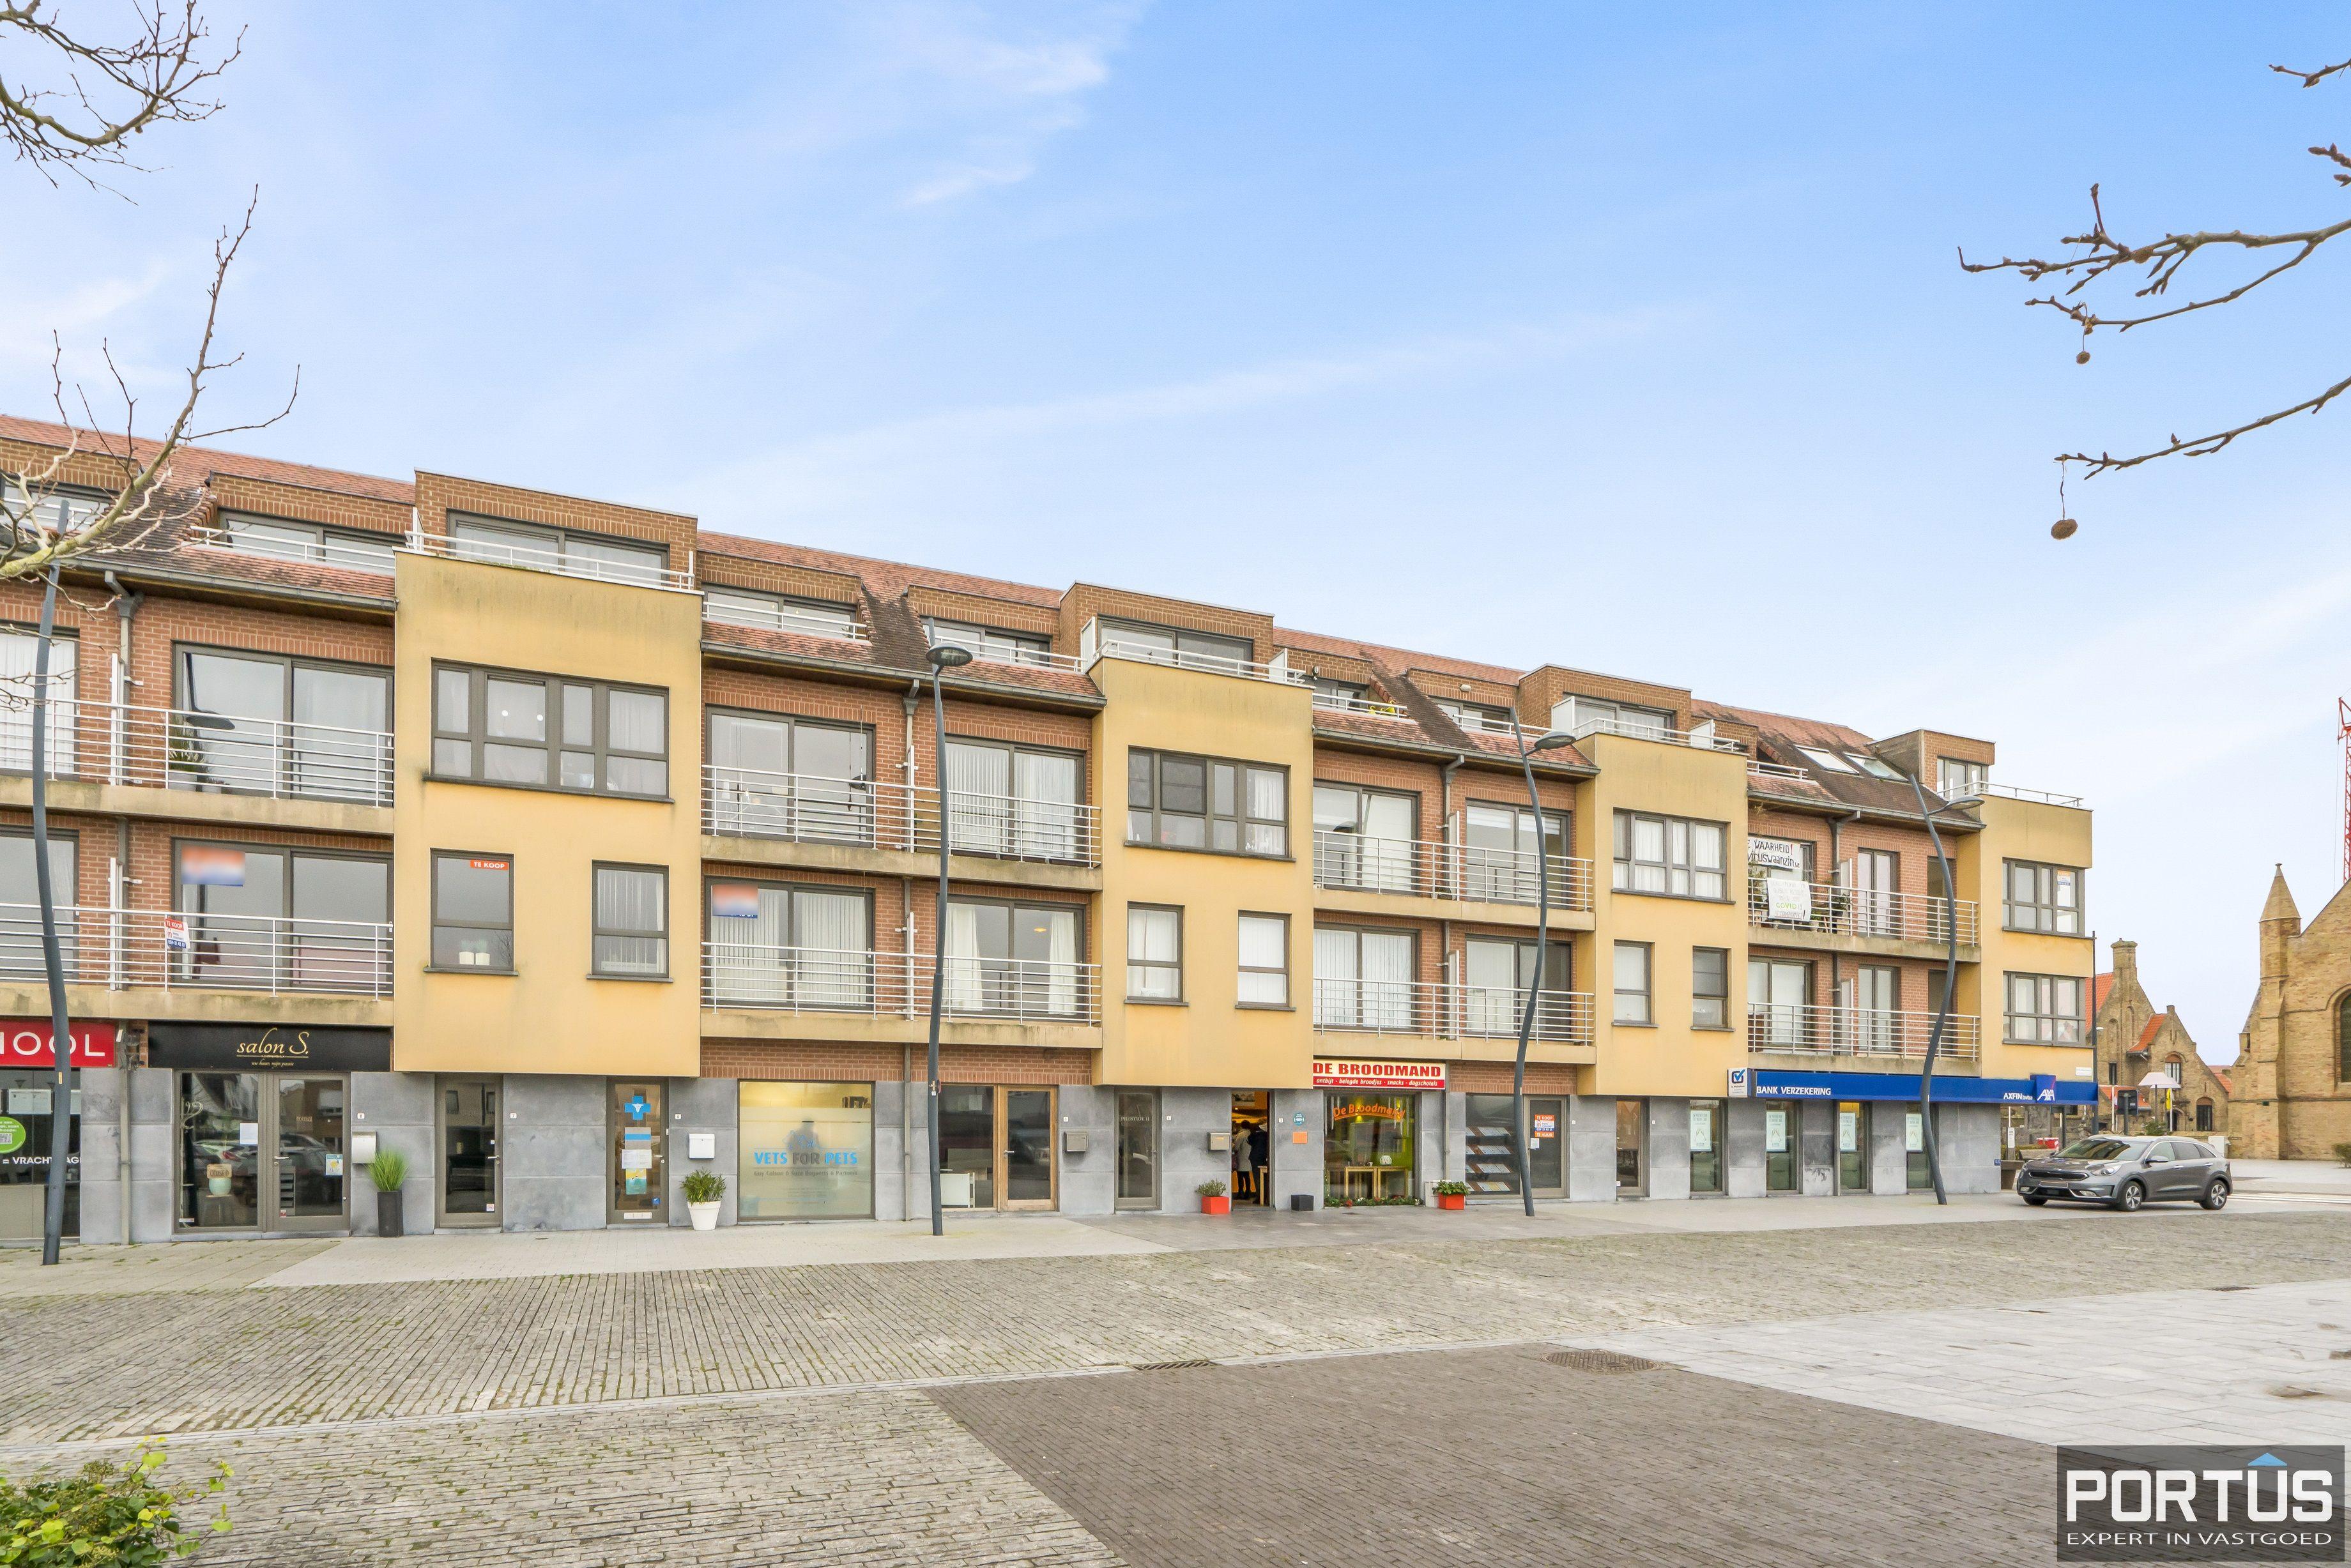 Instapklaar appartement met 1 slaapkamer te koop te Westende - 12051